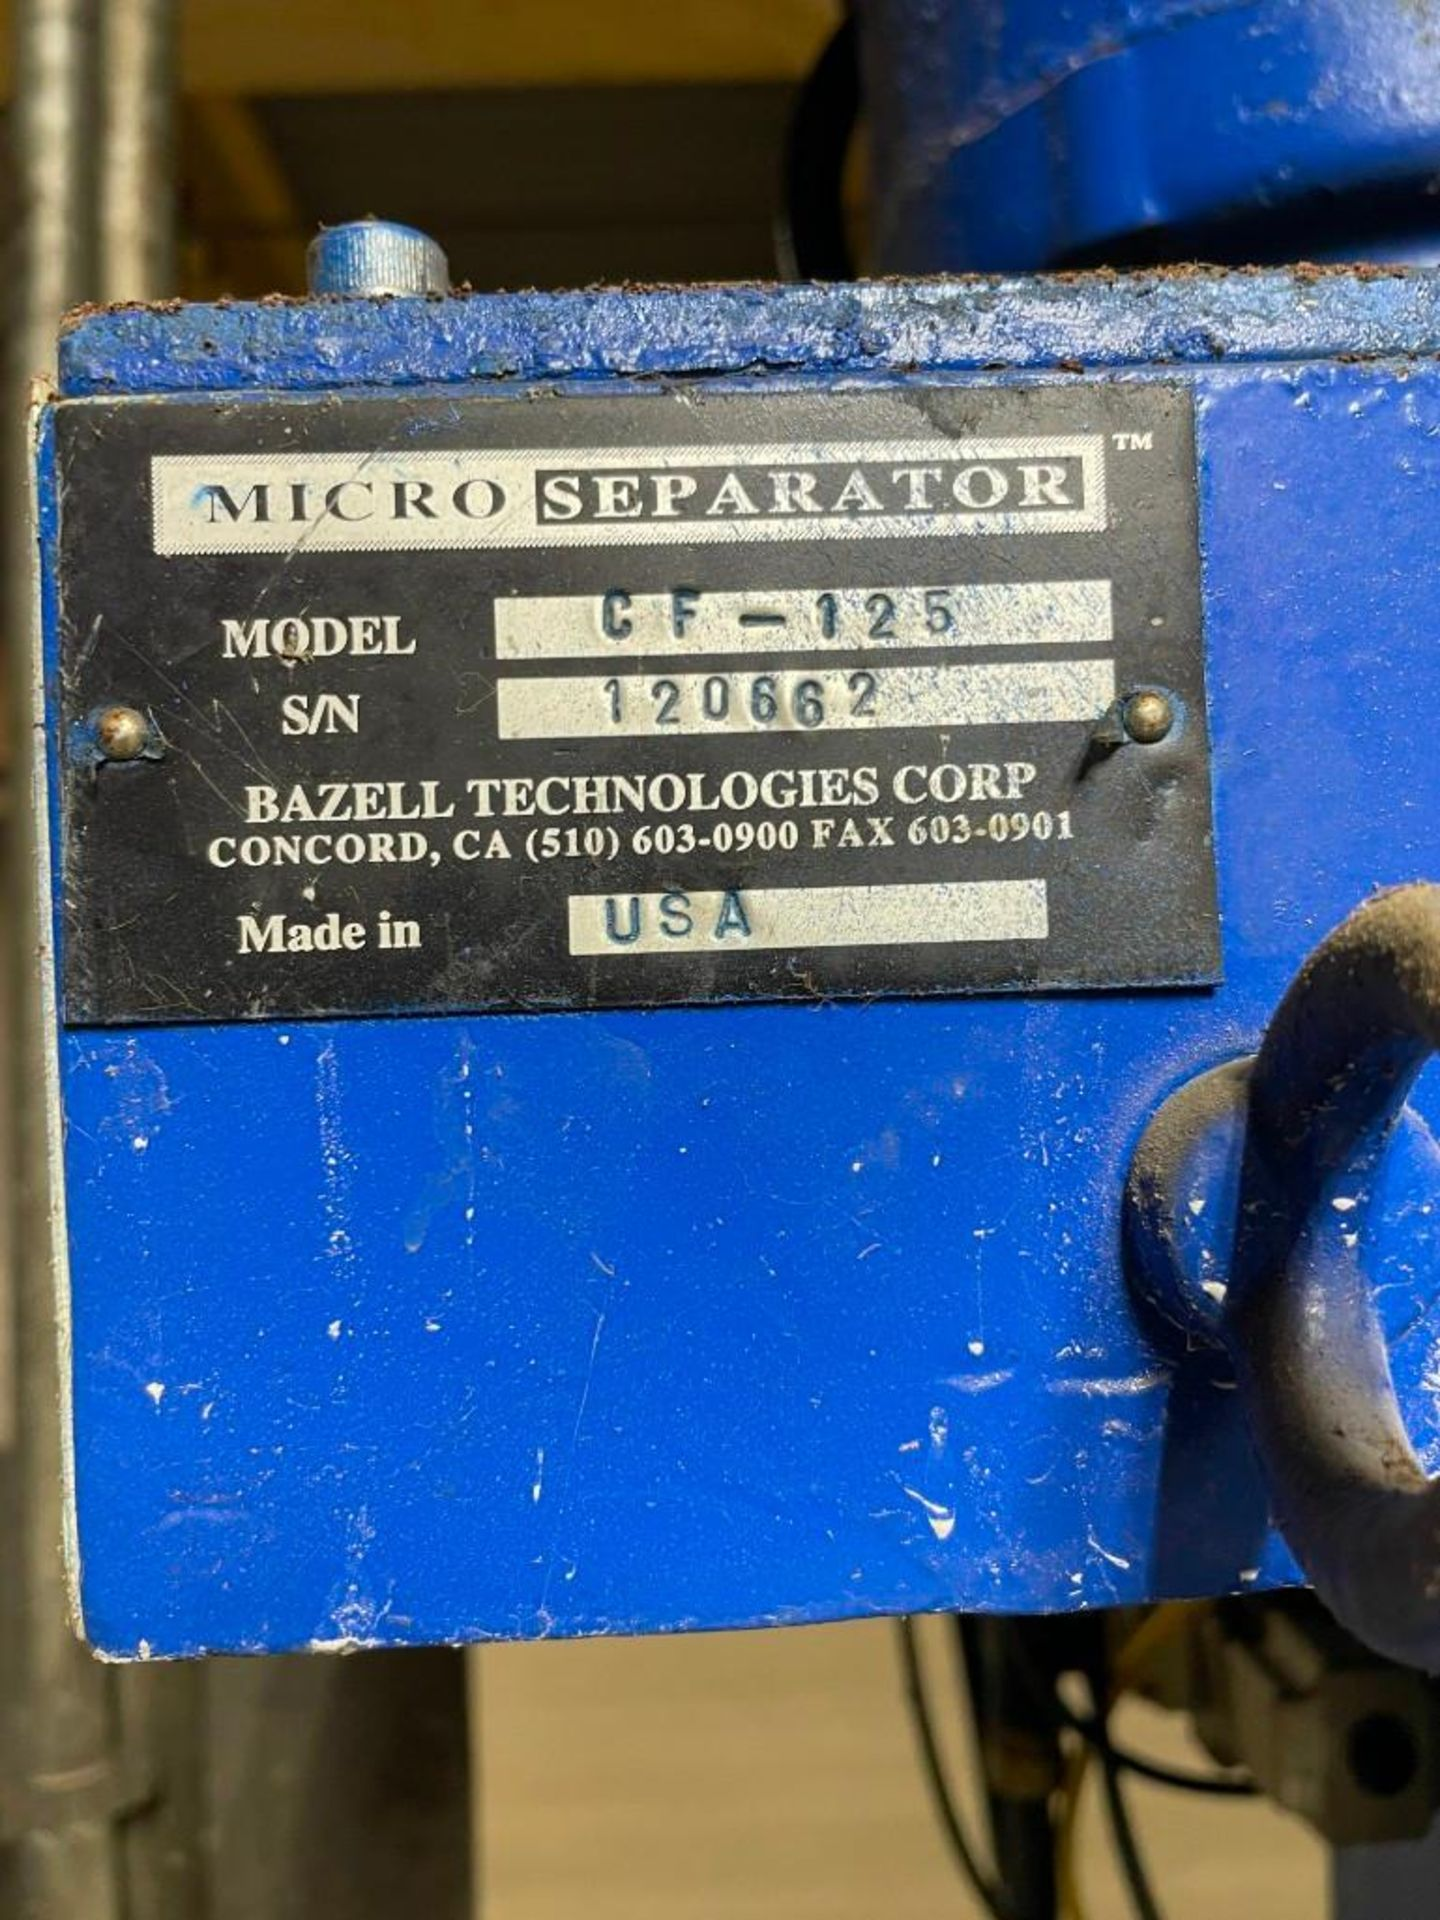 Micro Separator CF-125 Centrifugal Separator - Image 7 of 8